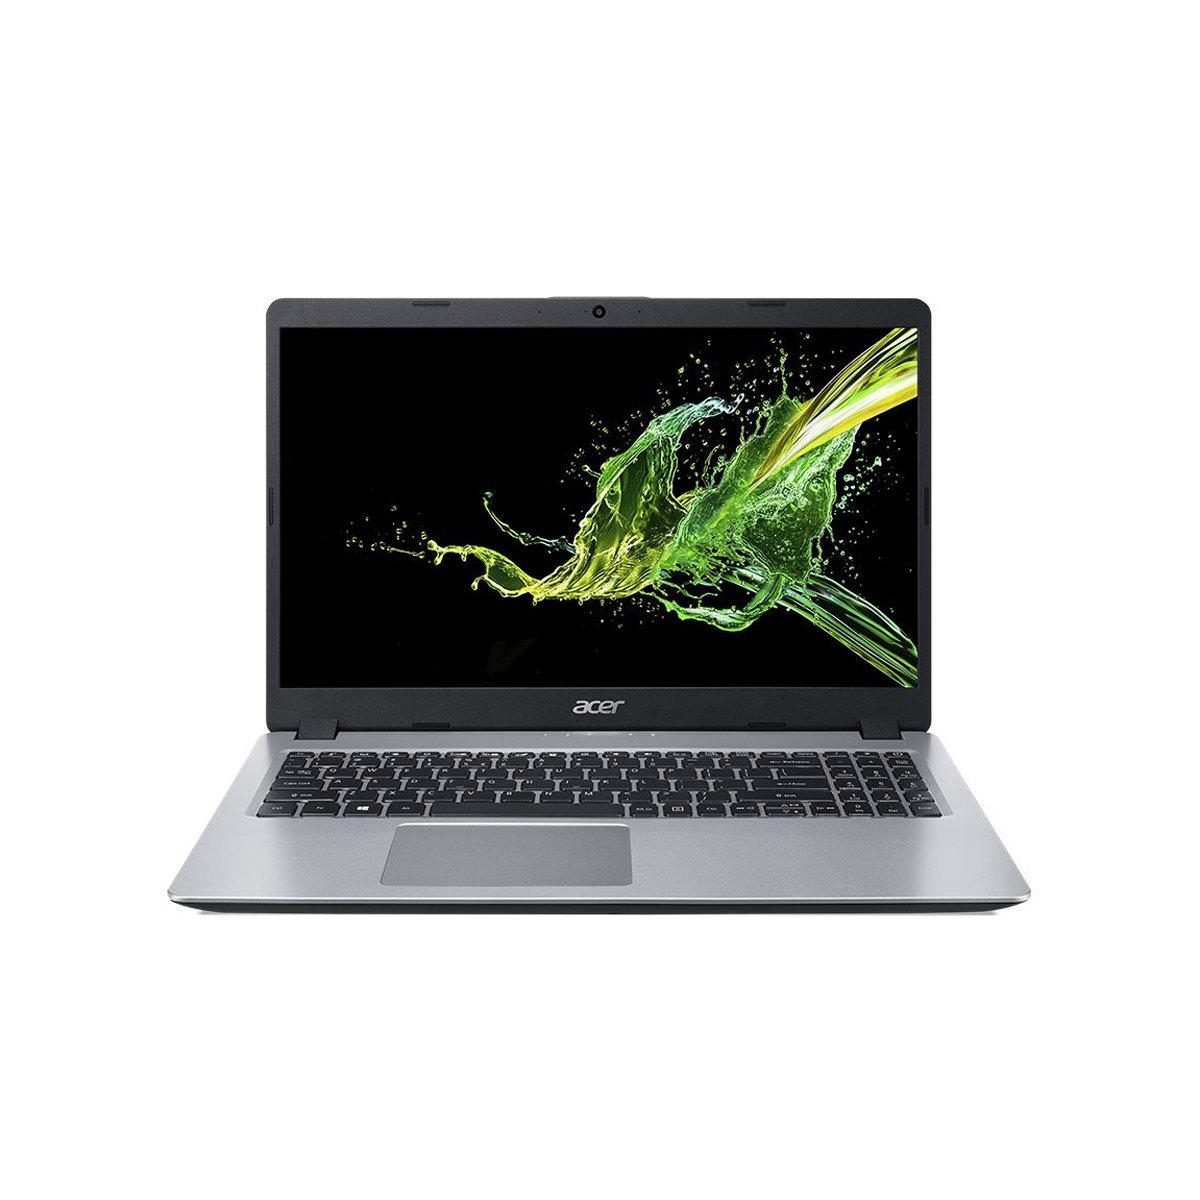 Notebook Acer A515 Core I5 8265u Memoria 4gb Ddr4 Ssd 480gb Tela 15.6' Led Hd Sistema Windows 10 Home